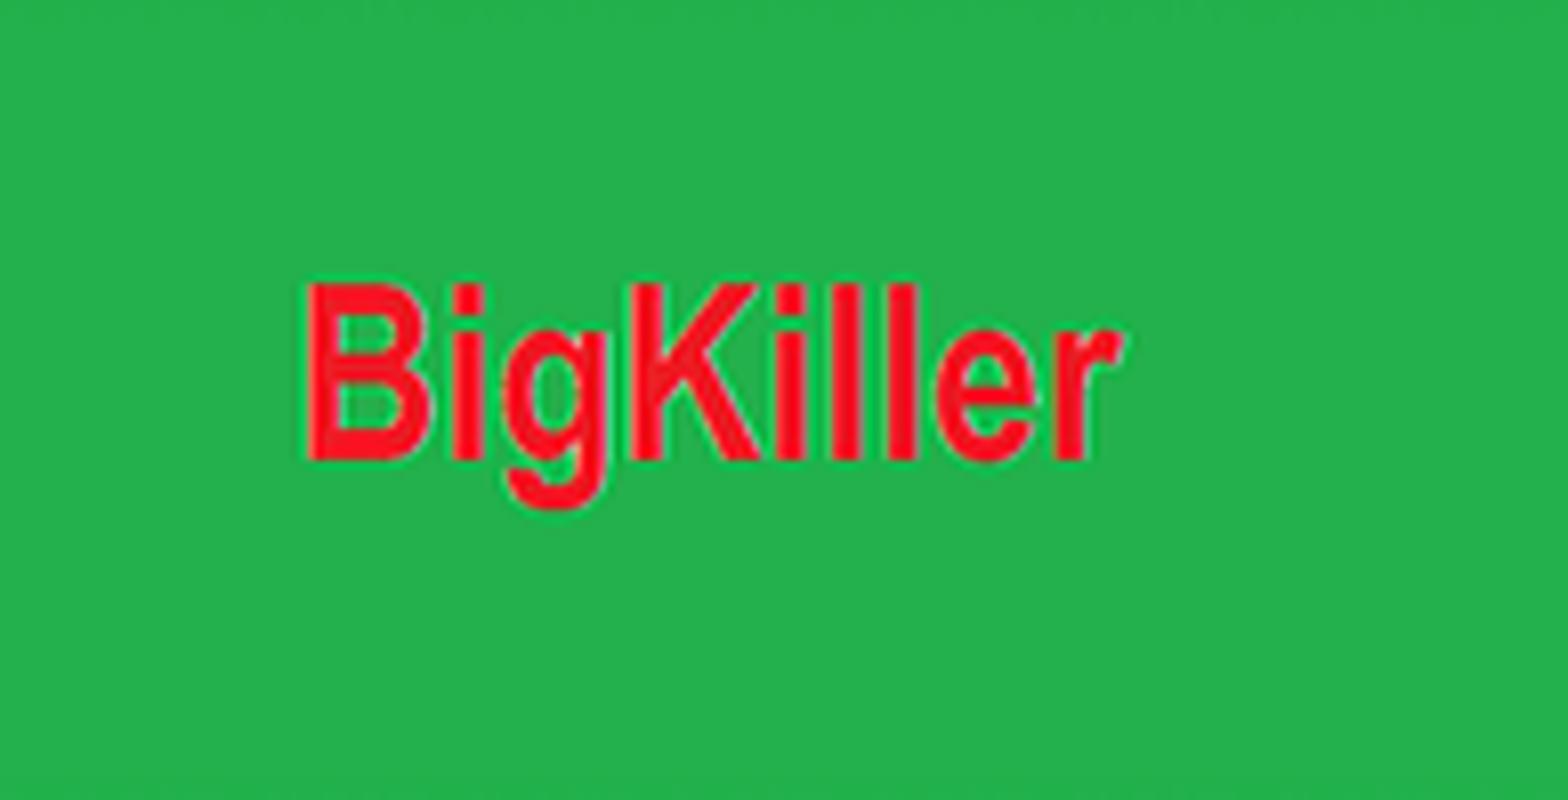 Play BigKiller(DEMO)